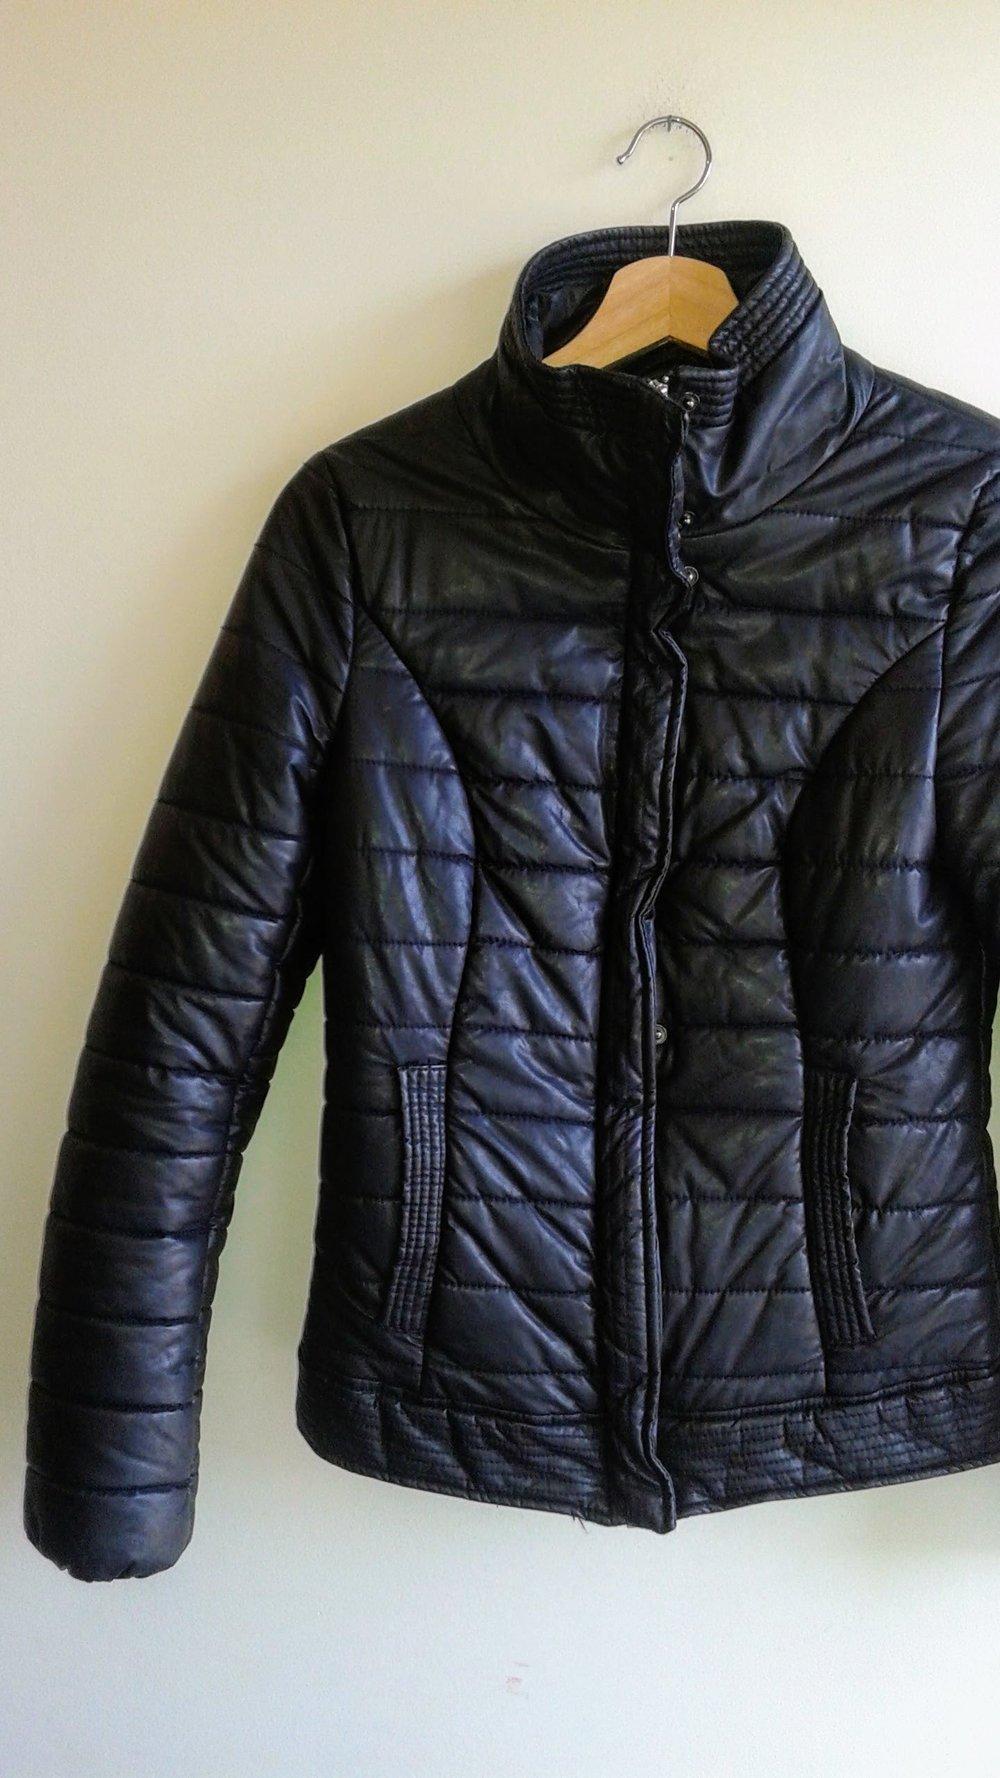 Soya Concepts jacket; Size XS, $62